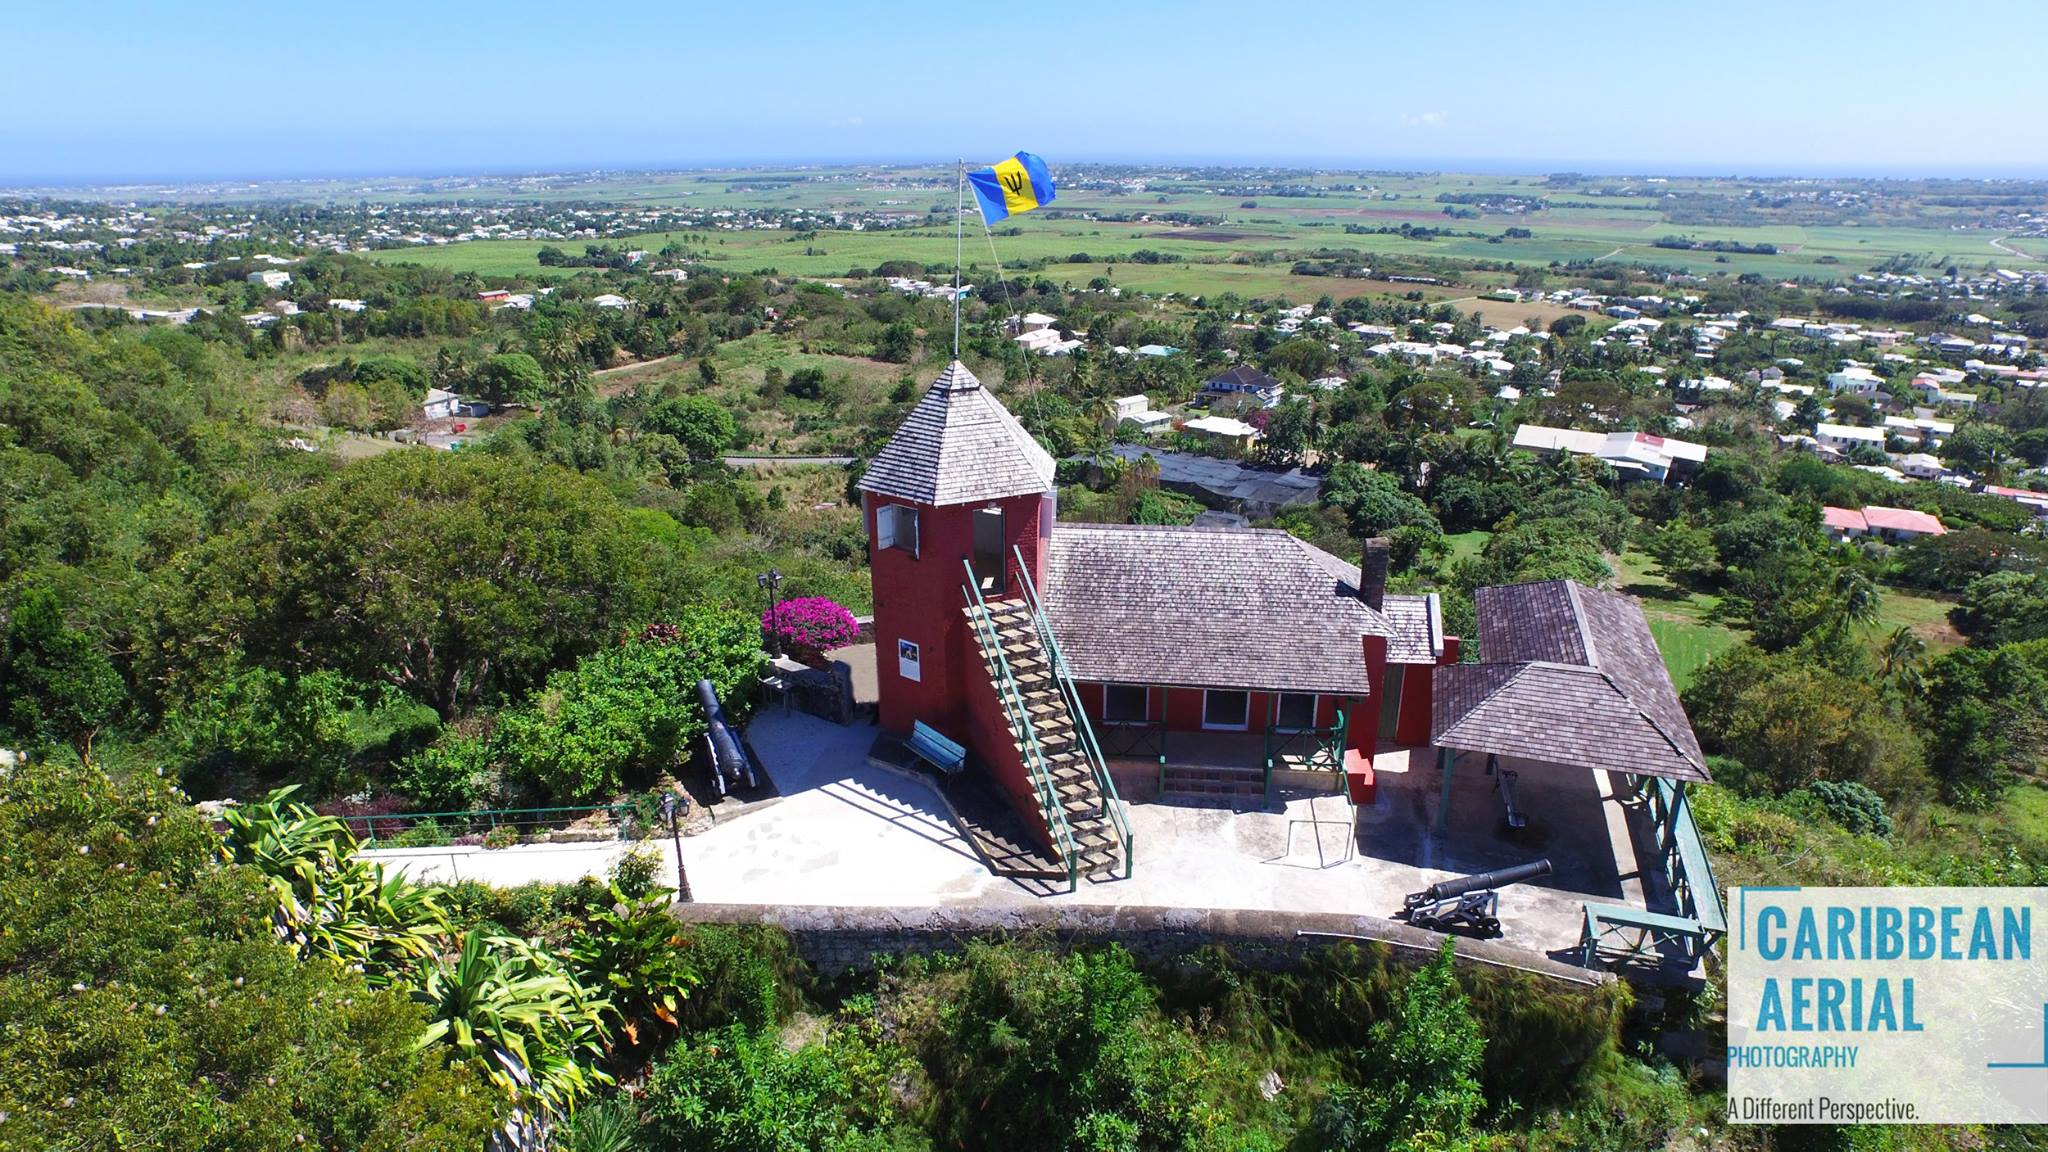 caribbean-aerial-photography-033